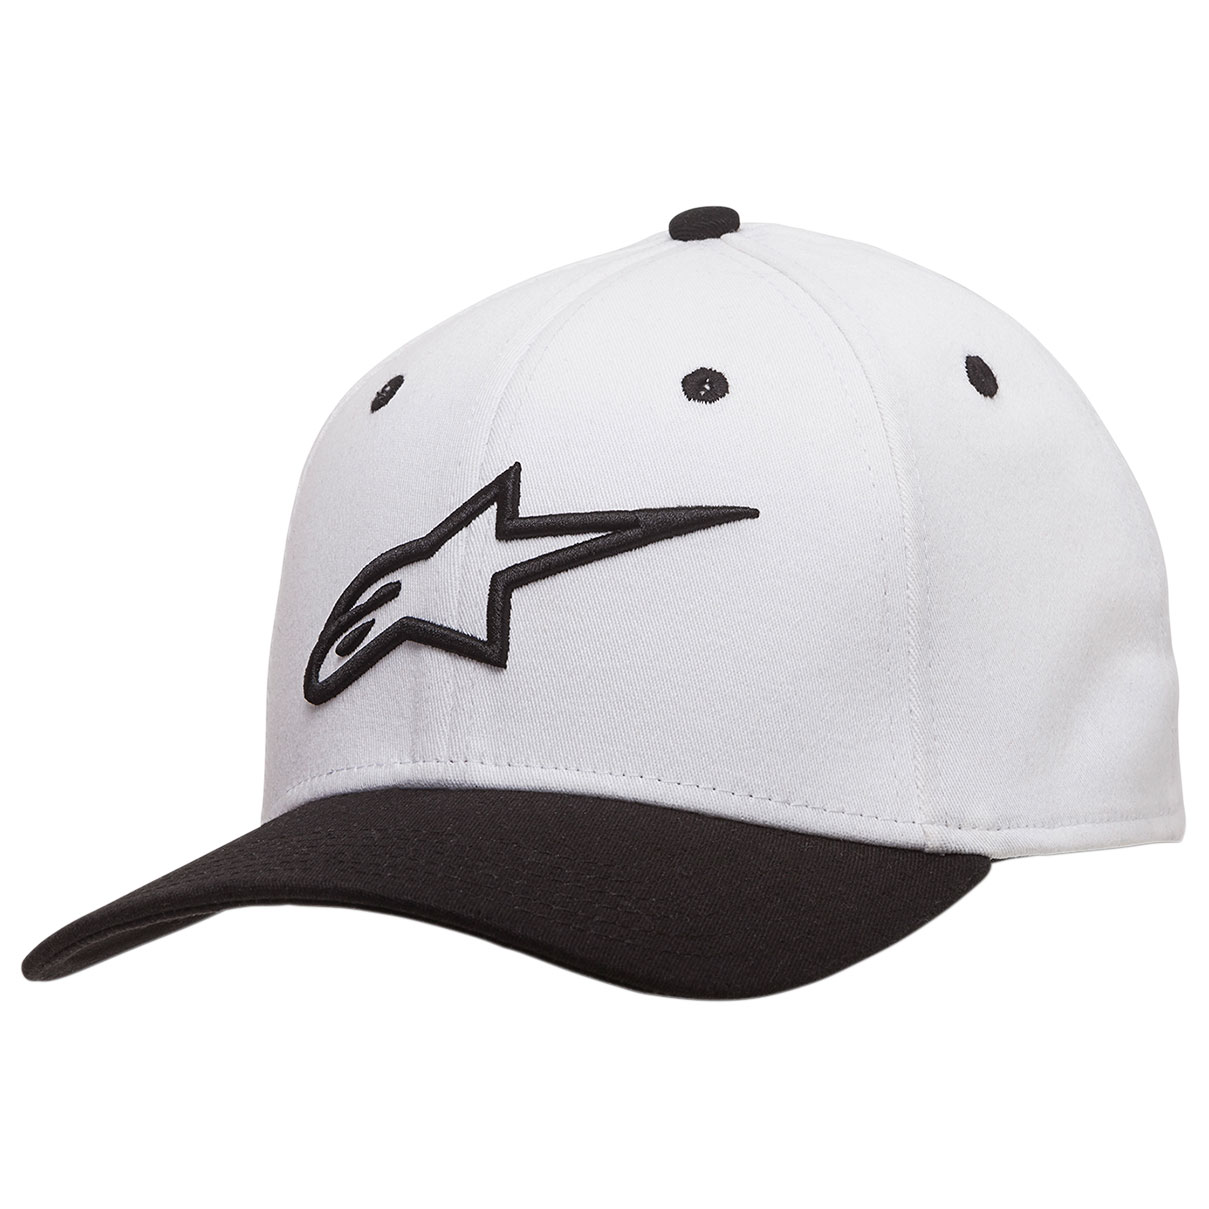 Alpinestars Men/'s Ageless Curved Hat